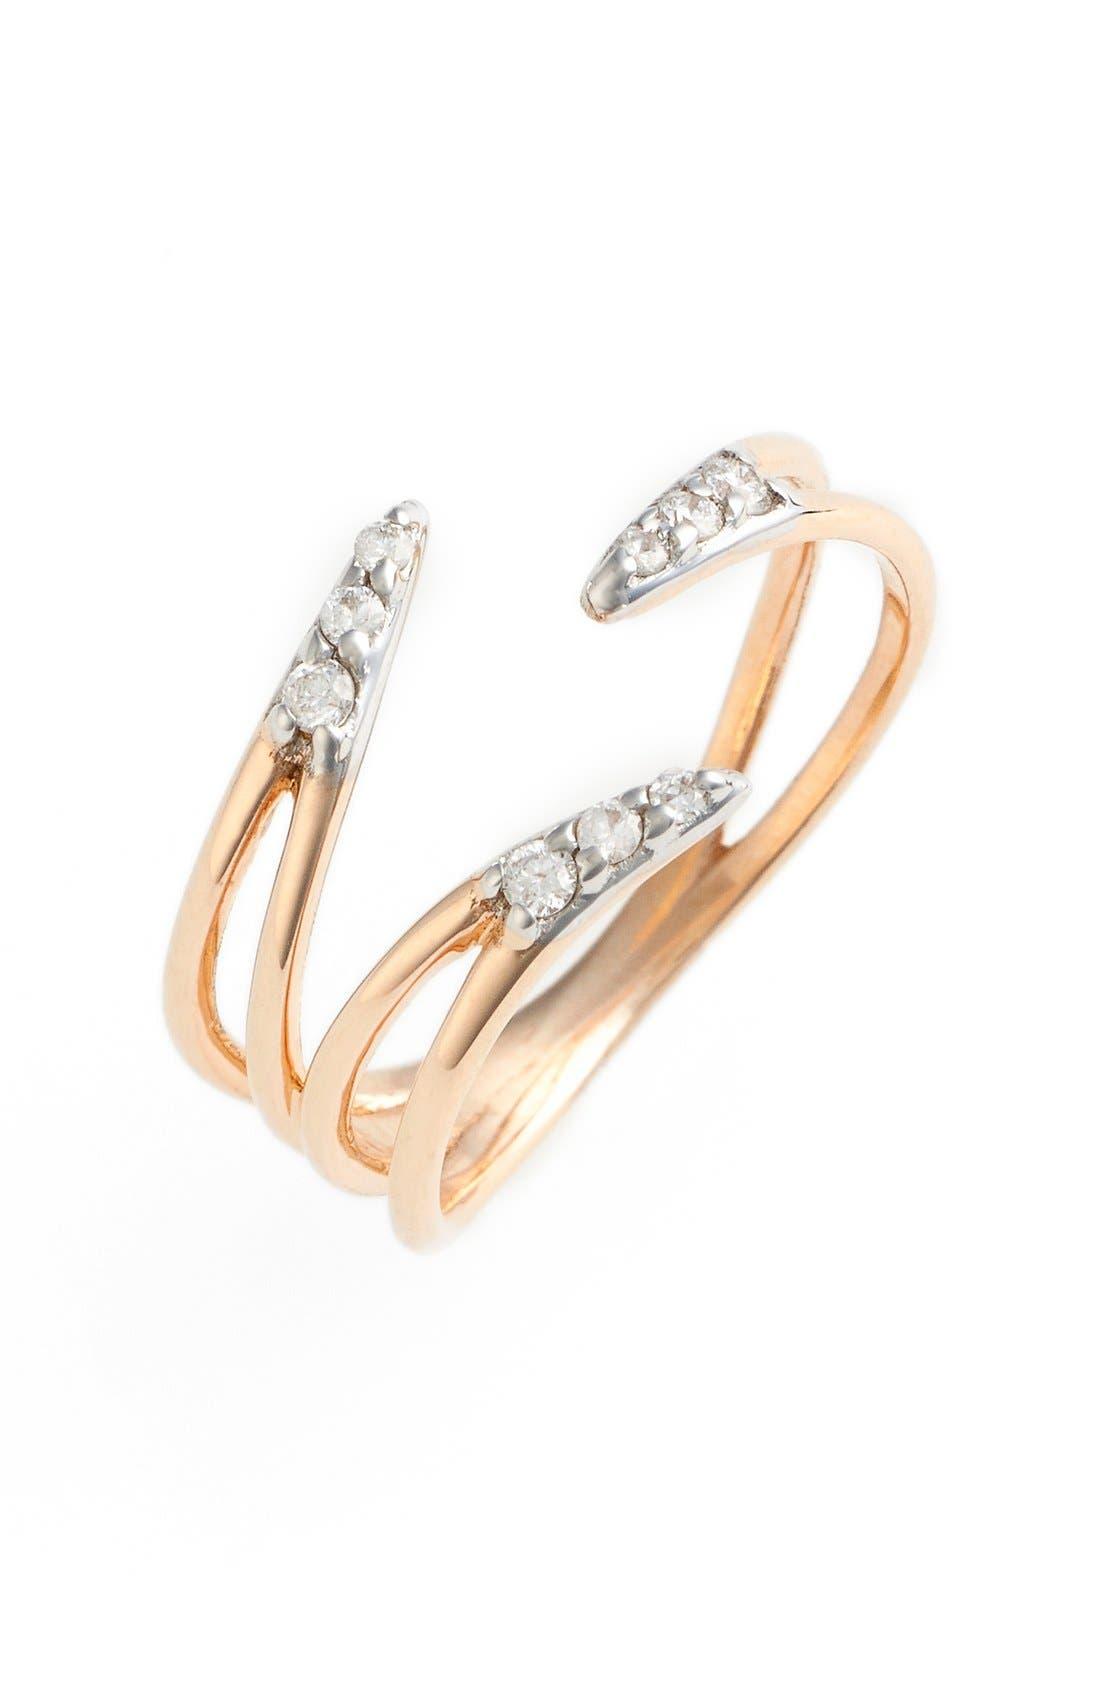 Alternate Image 1 Selected - kismet by milka 'Lumiere' Diamond Pinky Ring